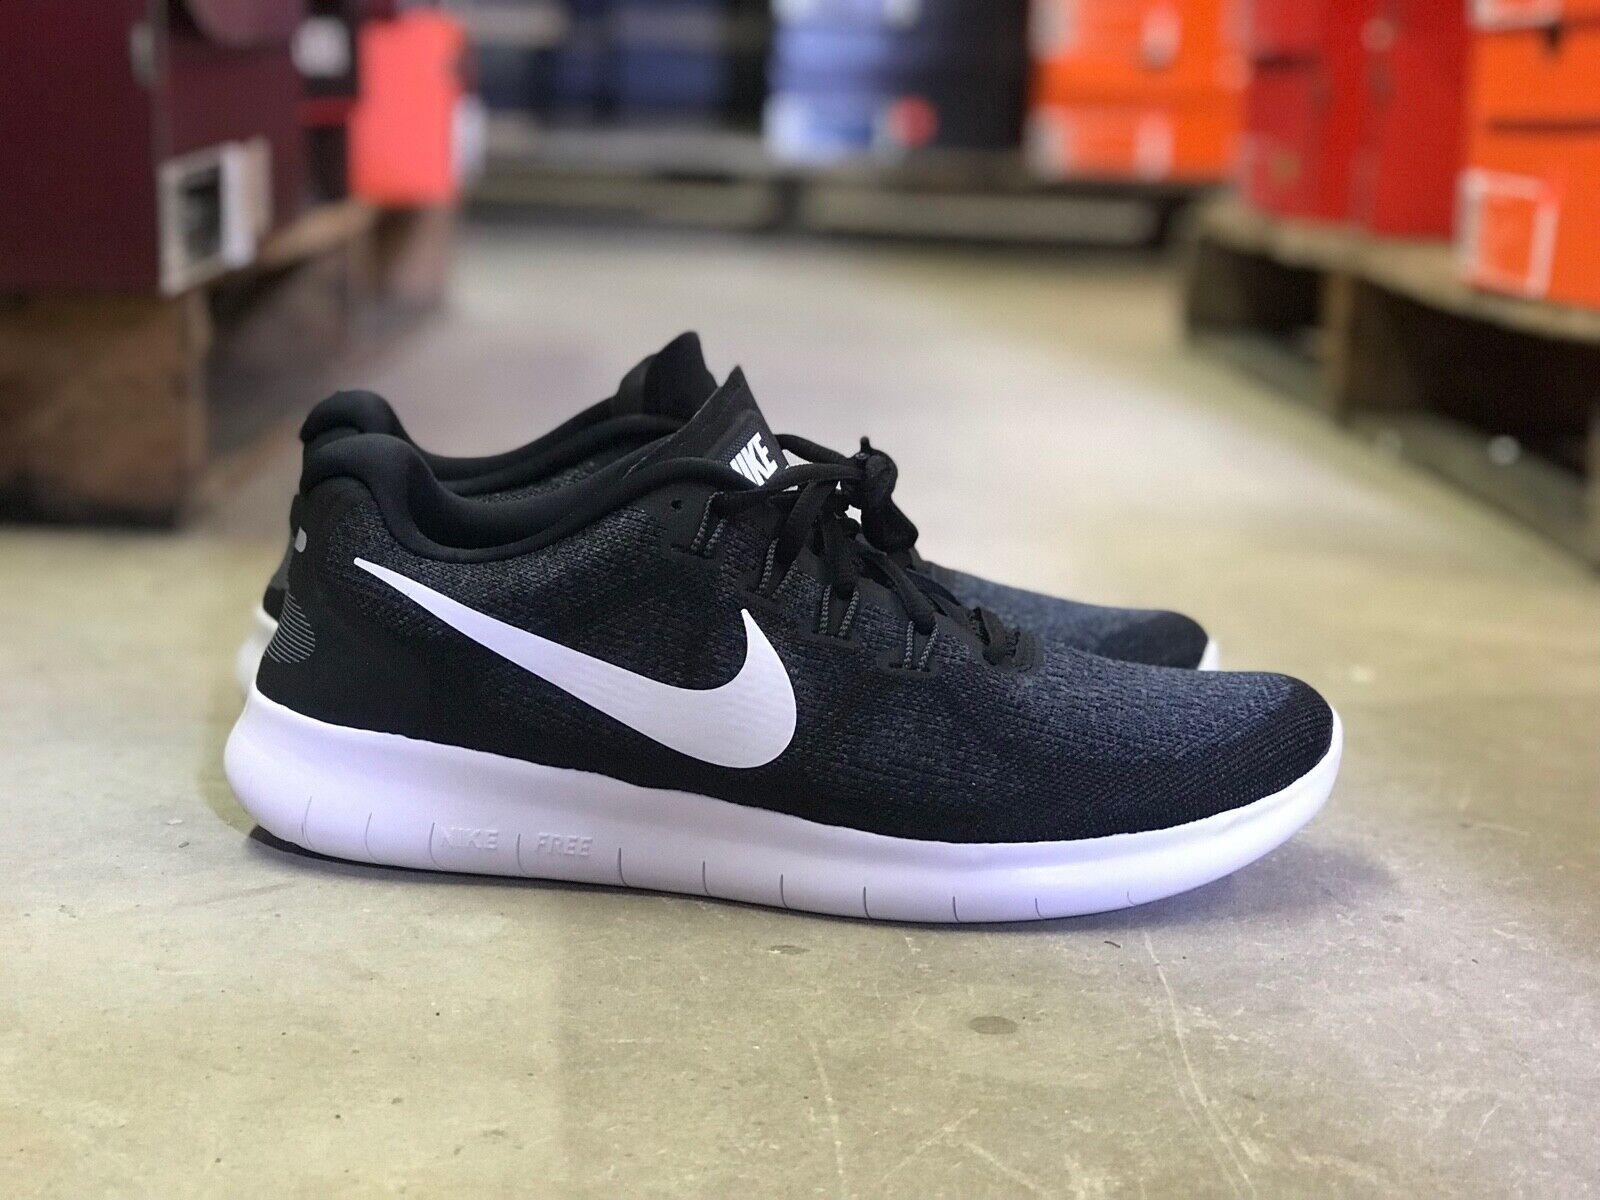 ef4593e10a215 Nike Free RN 2017 Mens Running shoes Black White 880839-001 NEW Multiple  Sizes